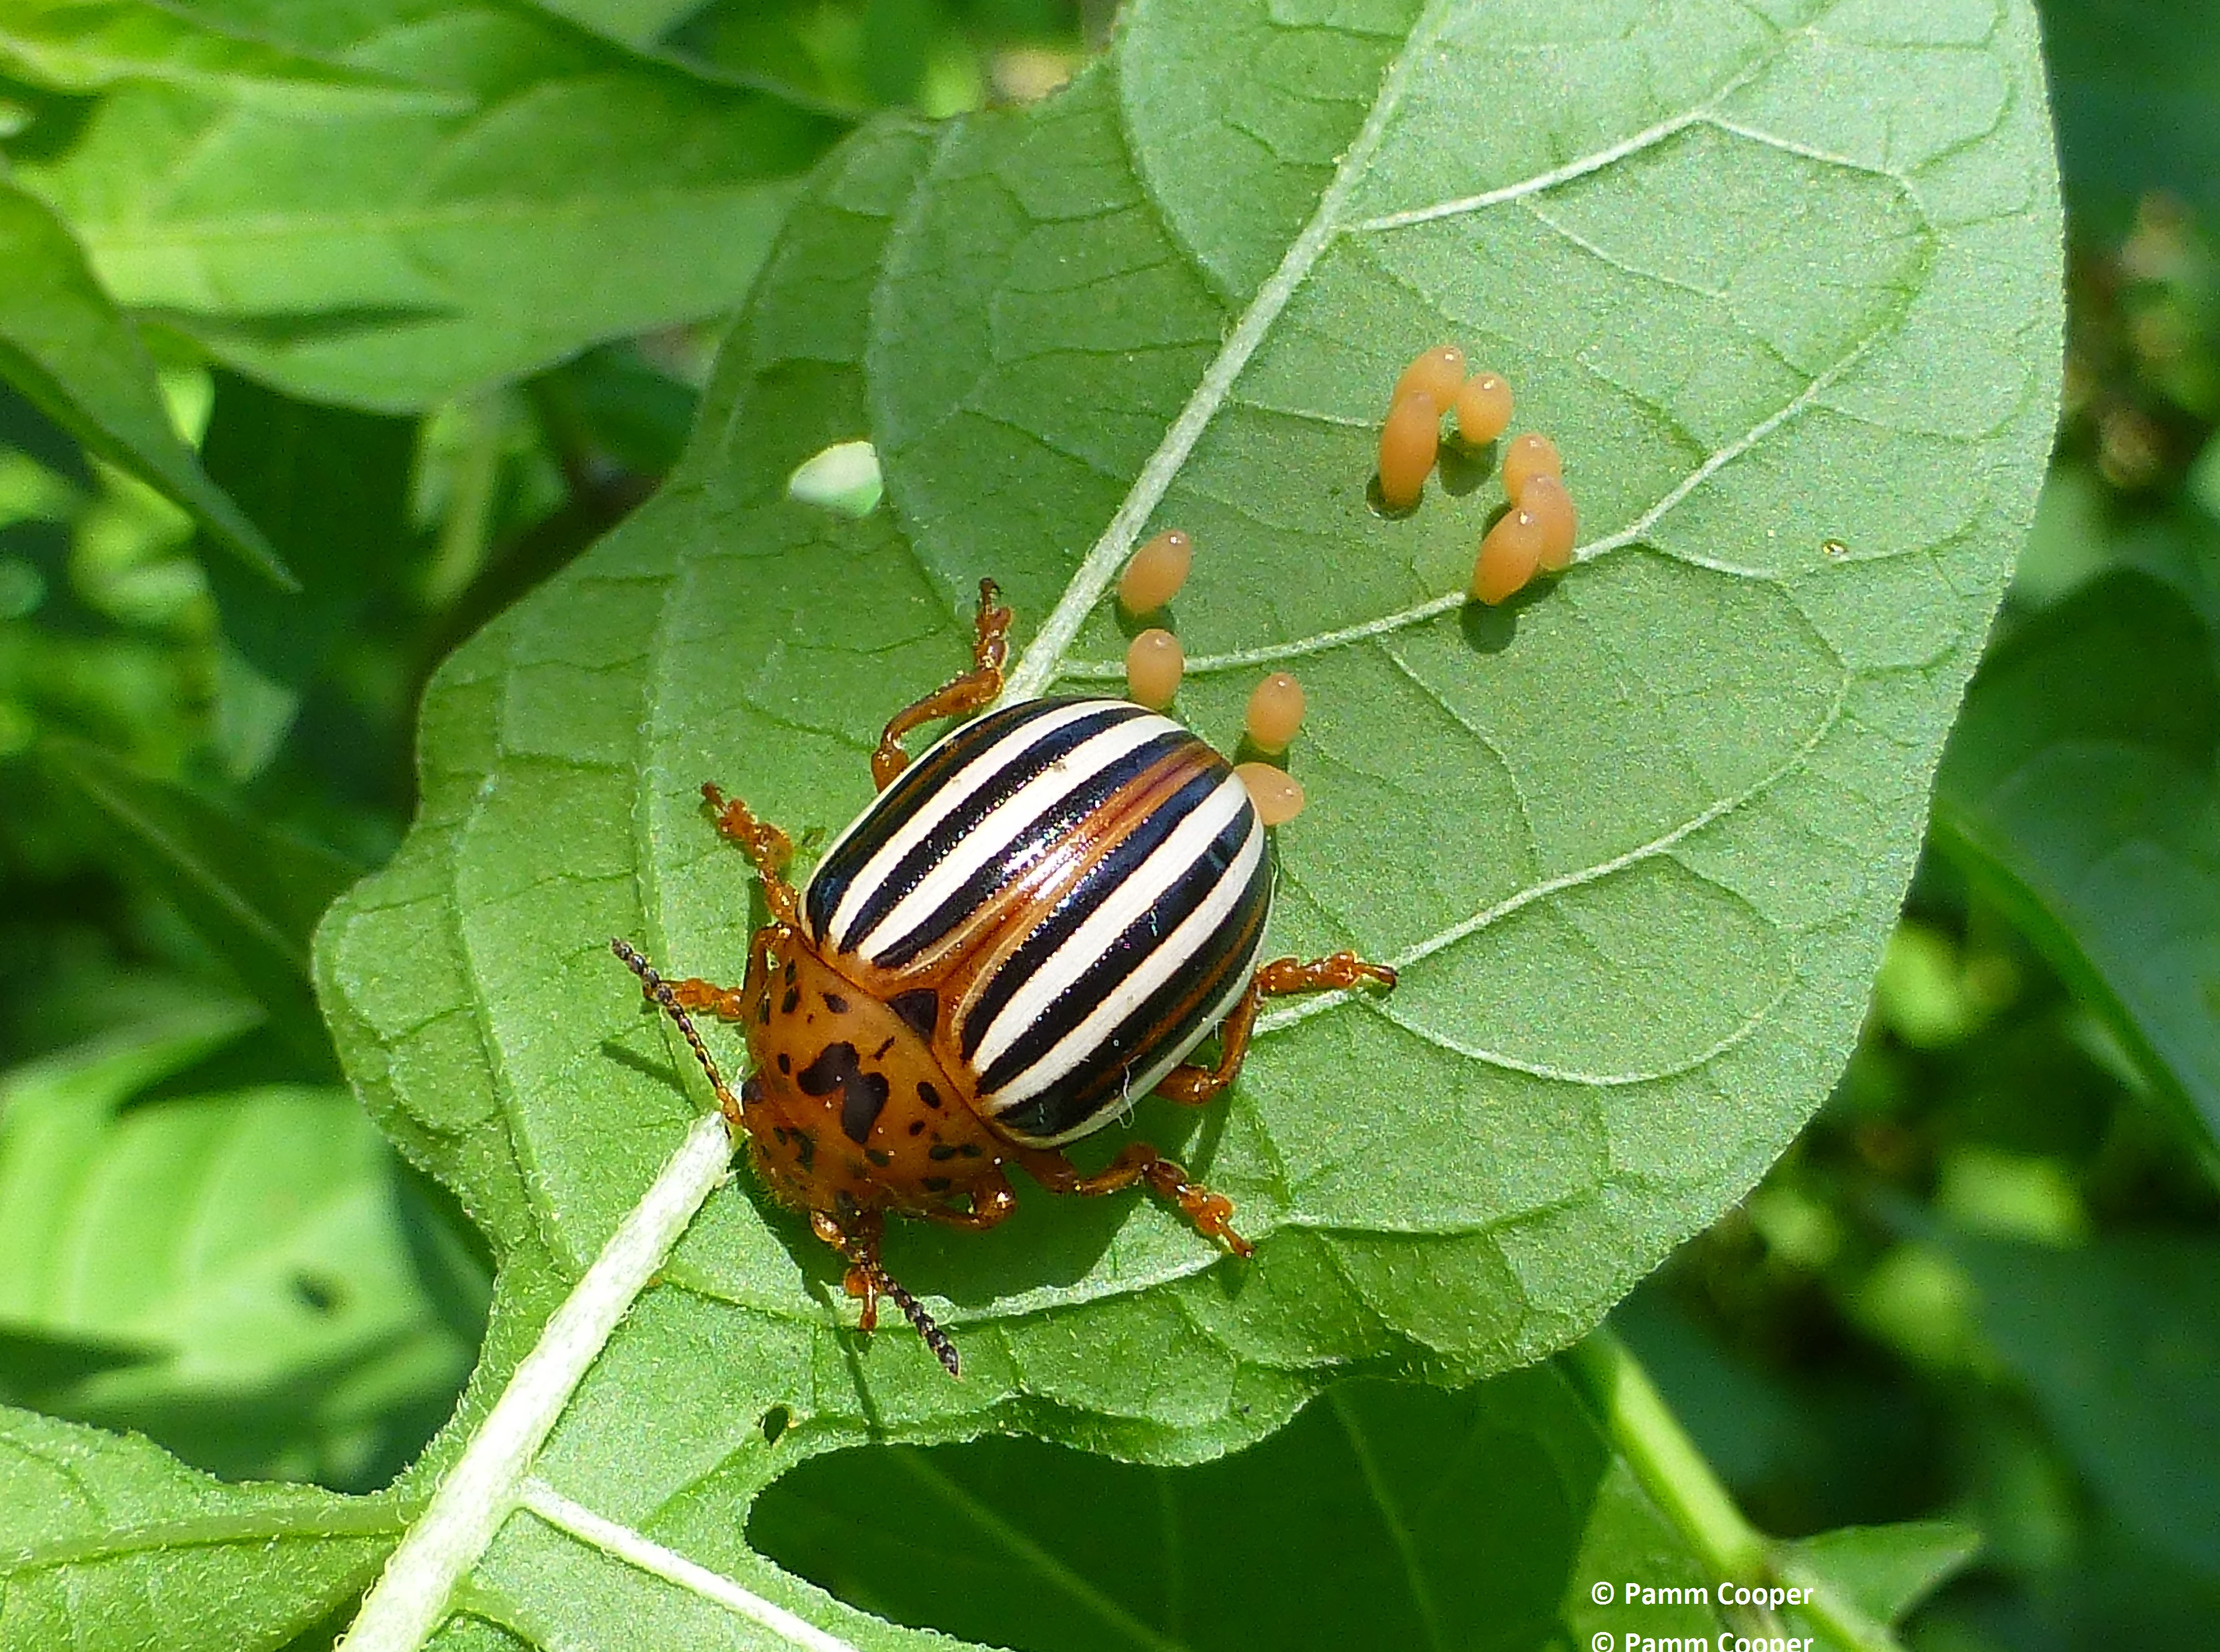 Colorado potato beetle June 2017pg